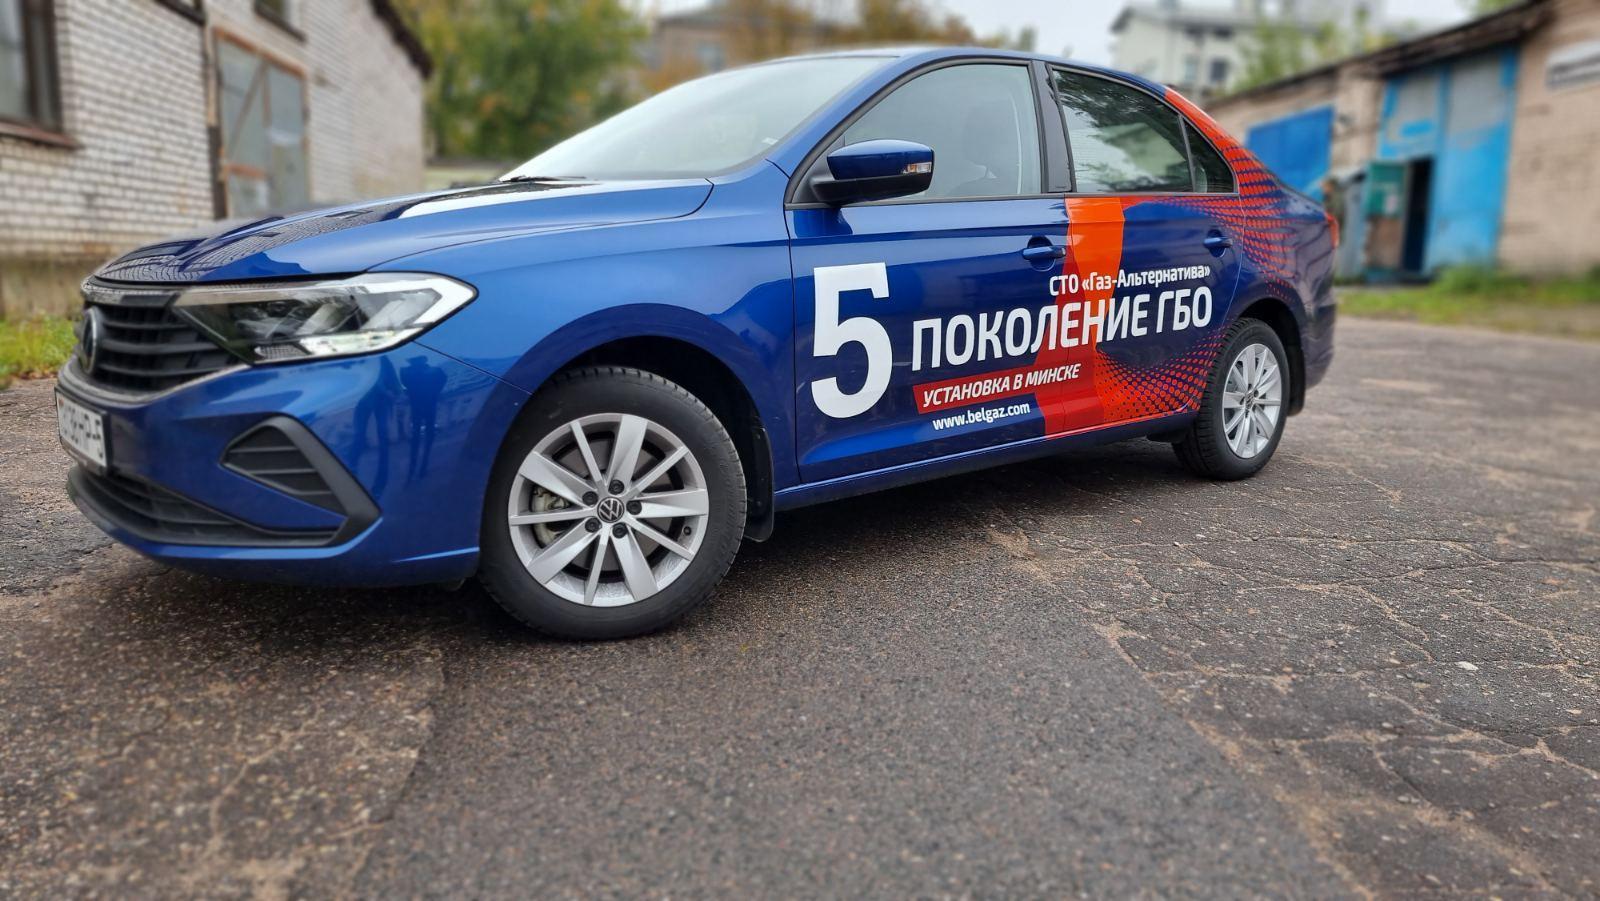 ГБО 5 поколения в Минске